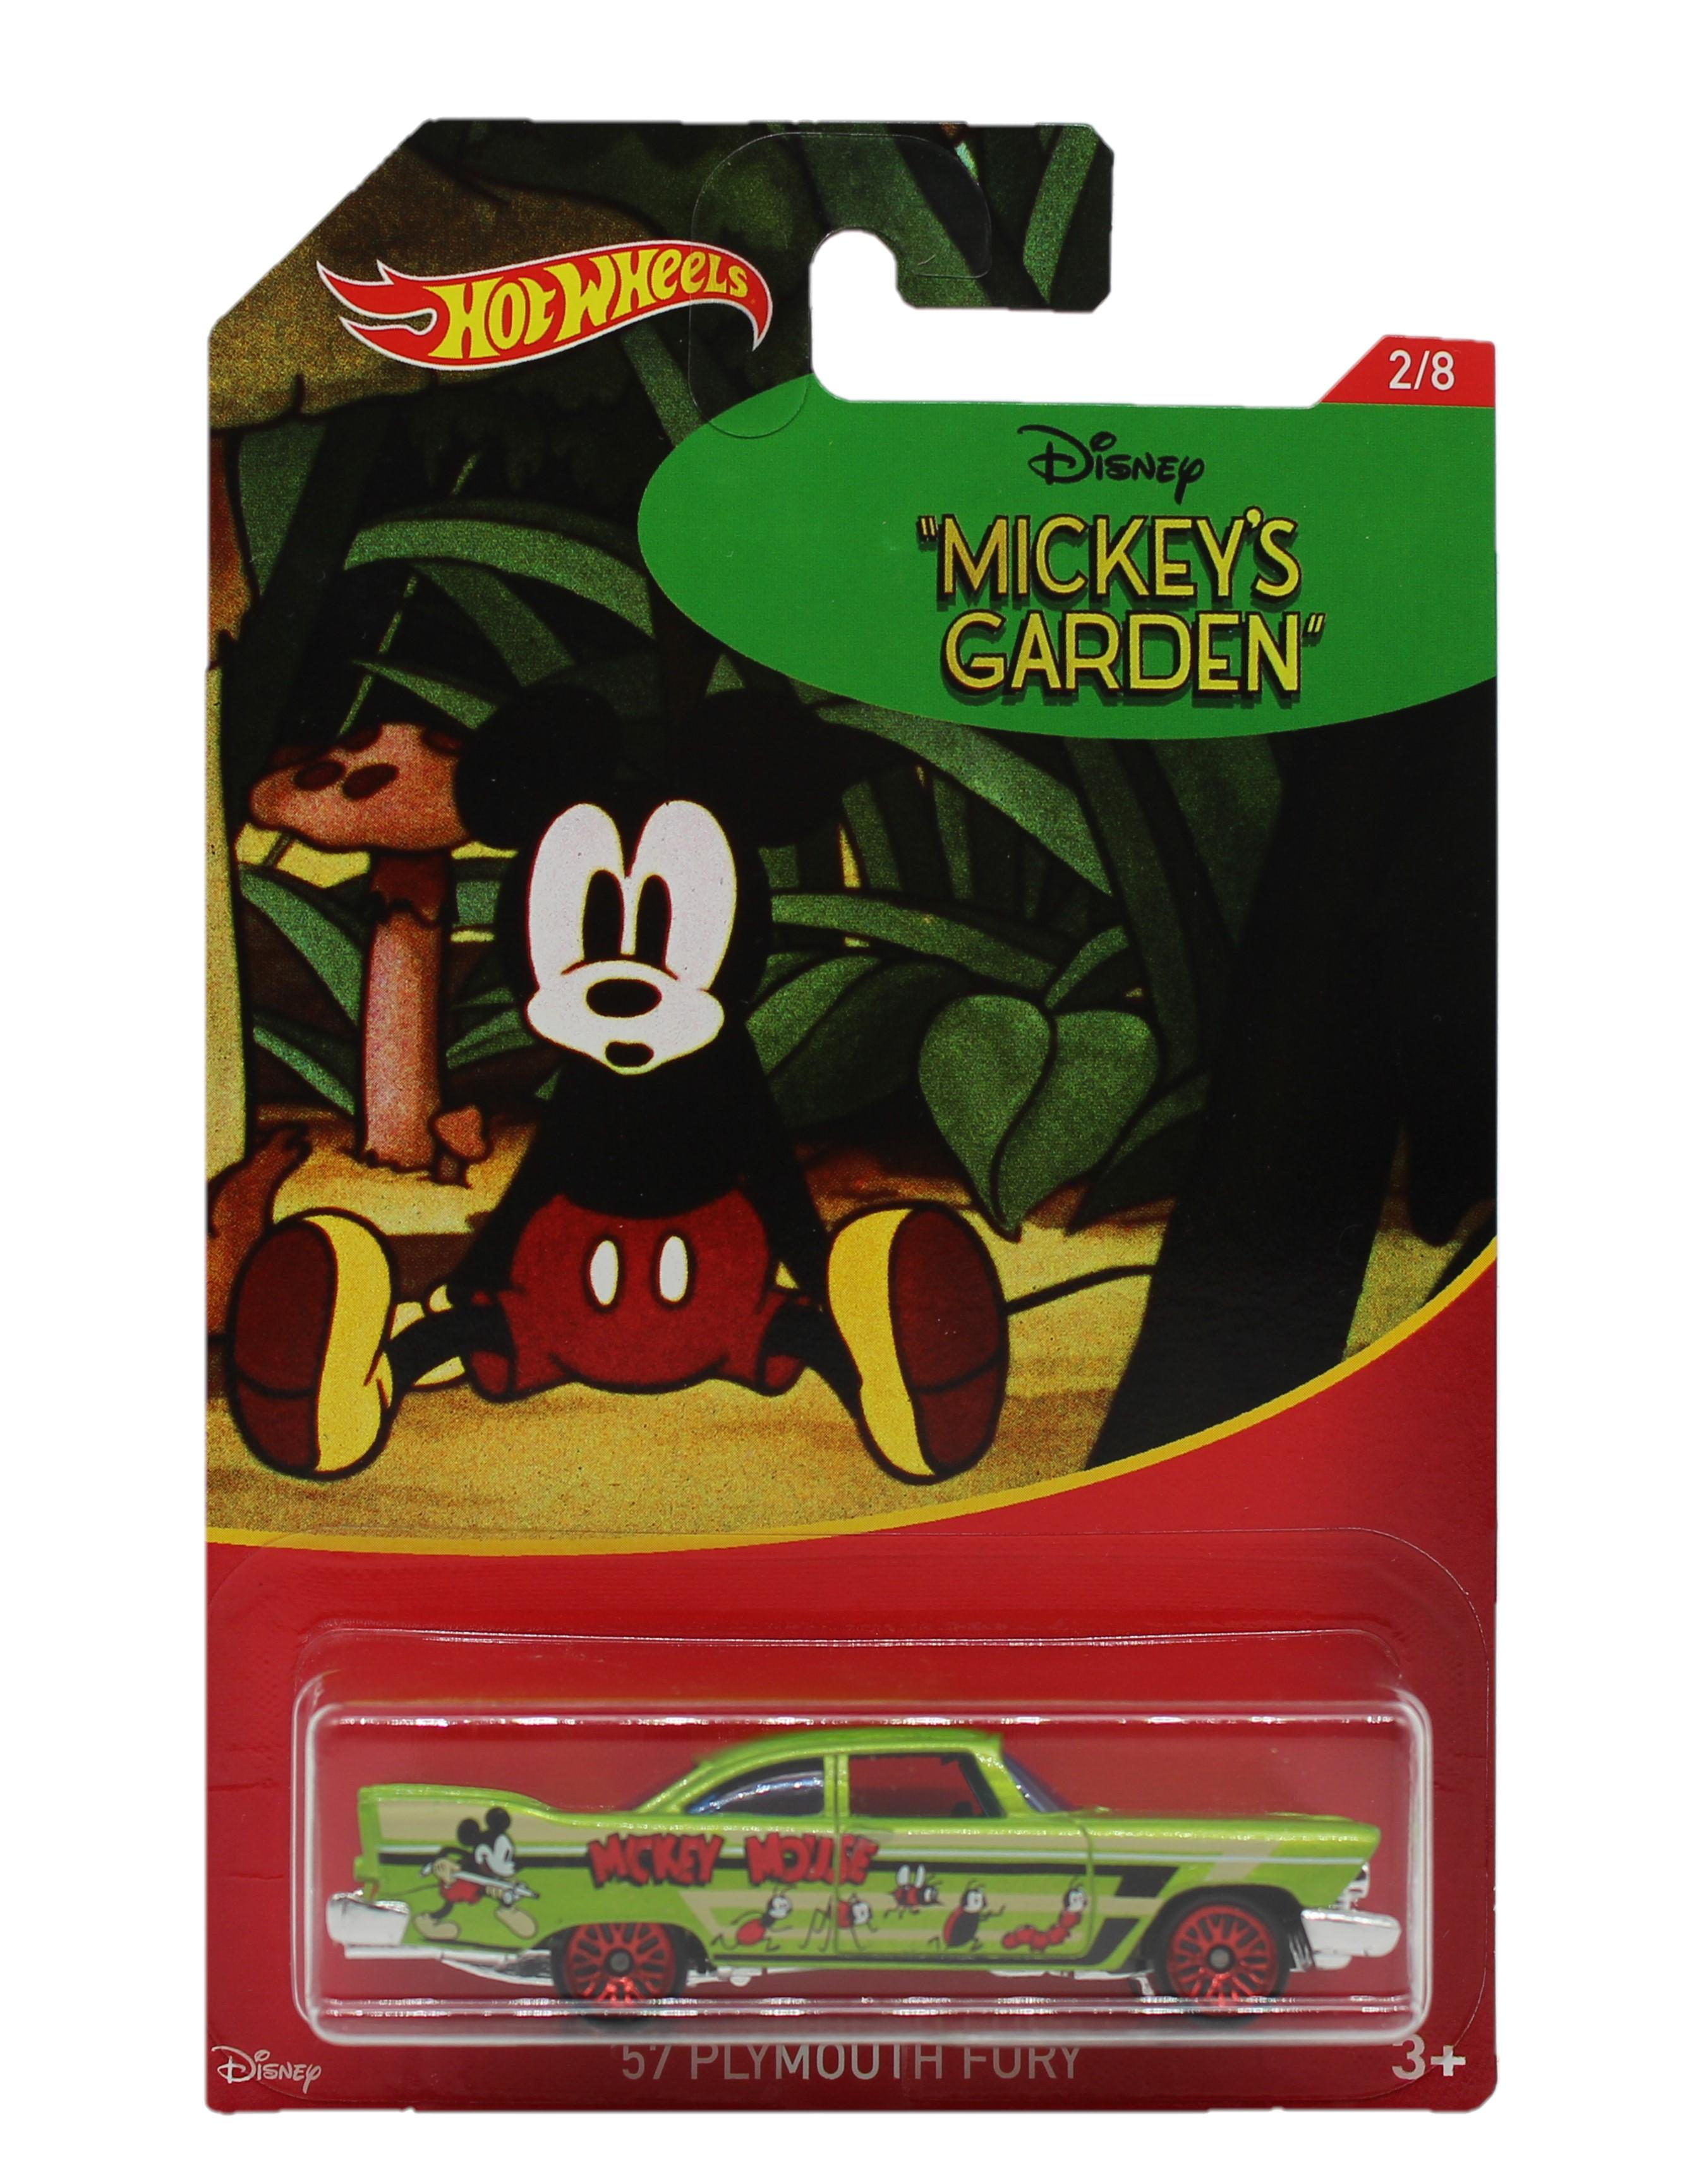 Hot Wheels Disney Mickey Mouse Fahrzeug ´57 Playmouth Fury